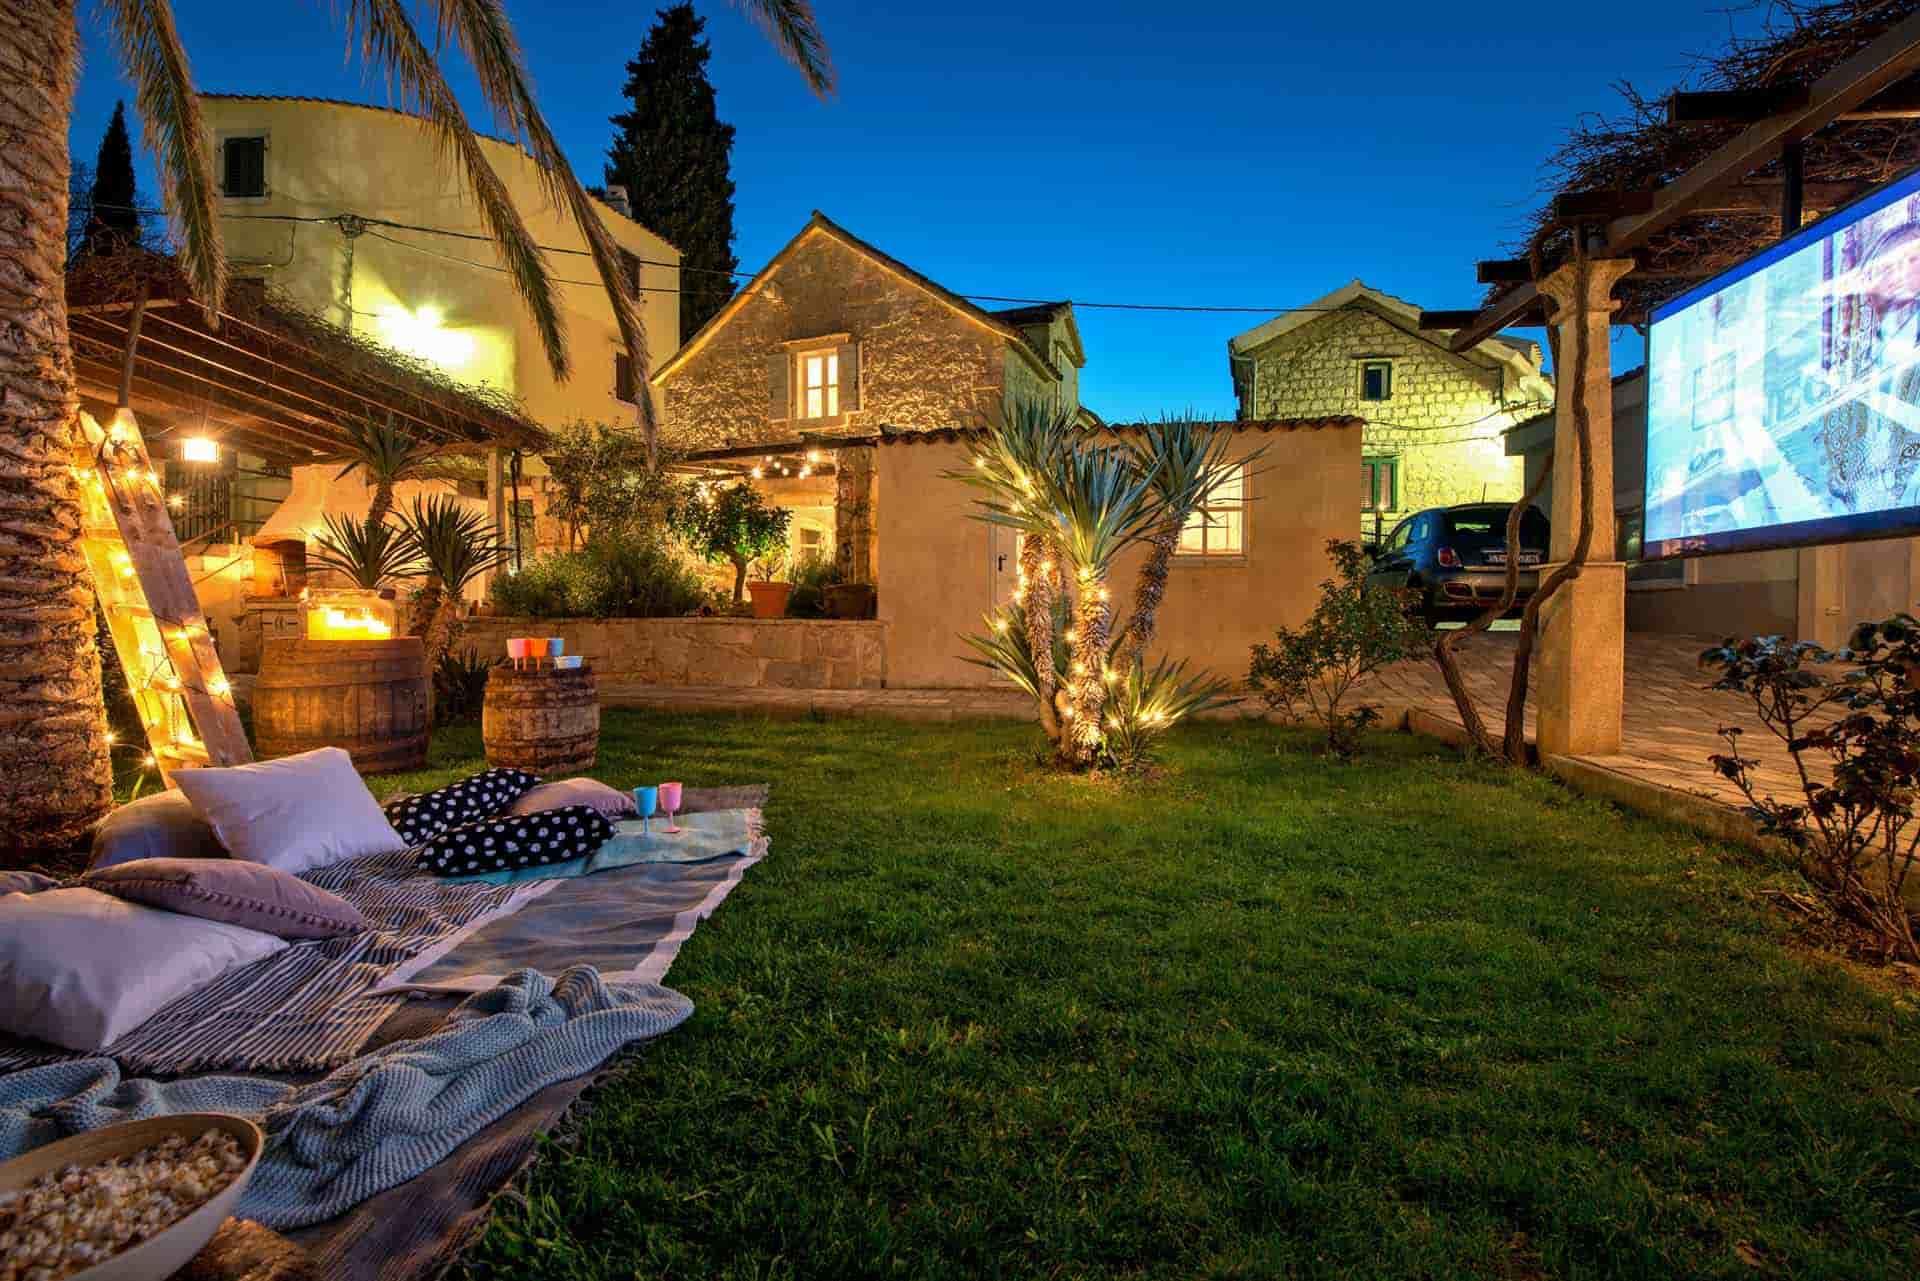 Romantična vila s unutarnjim bazenom